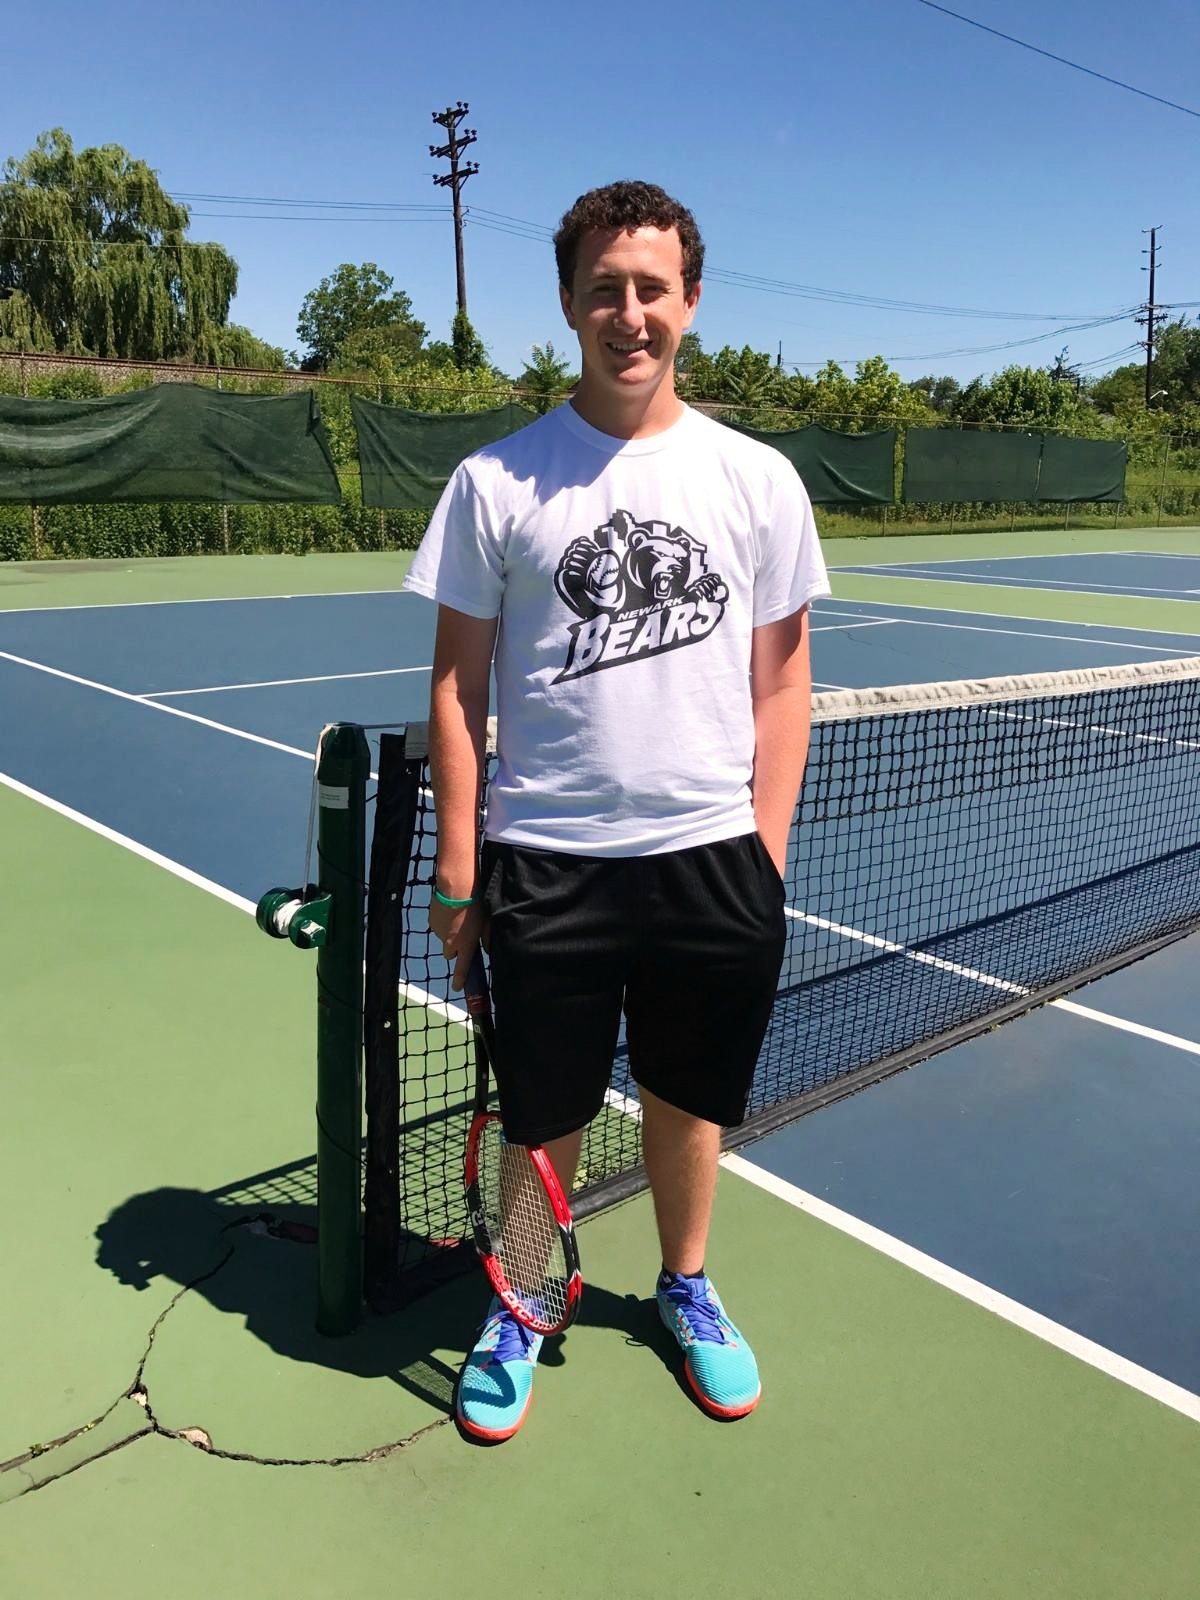 Miller S. teaches tennis lessons in Cranford , NJ